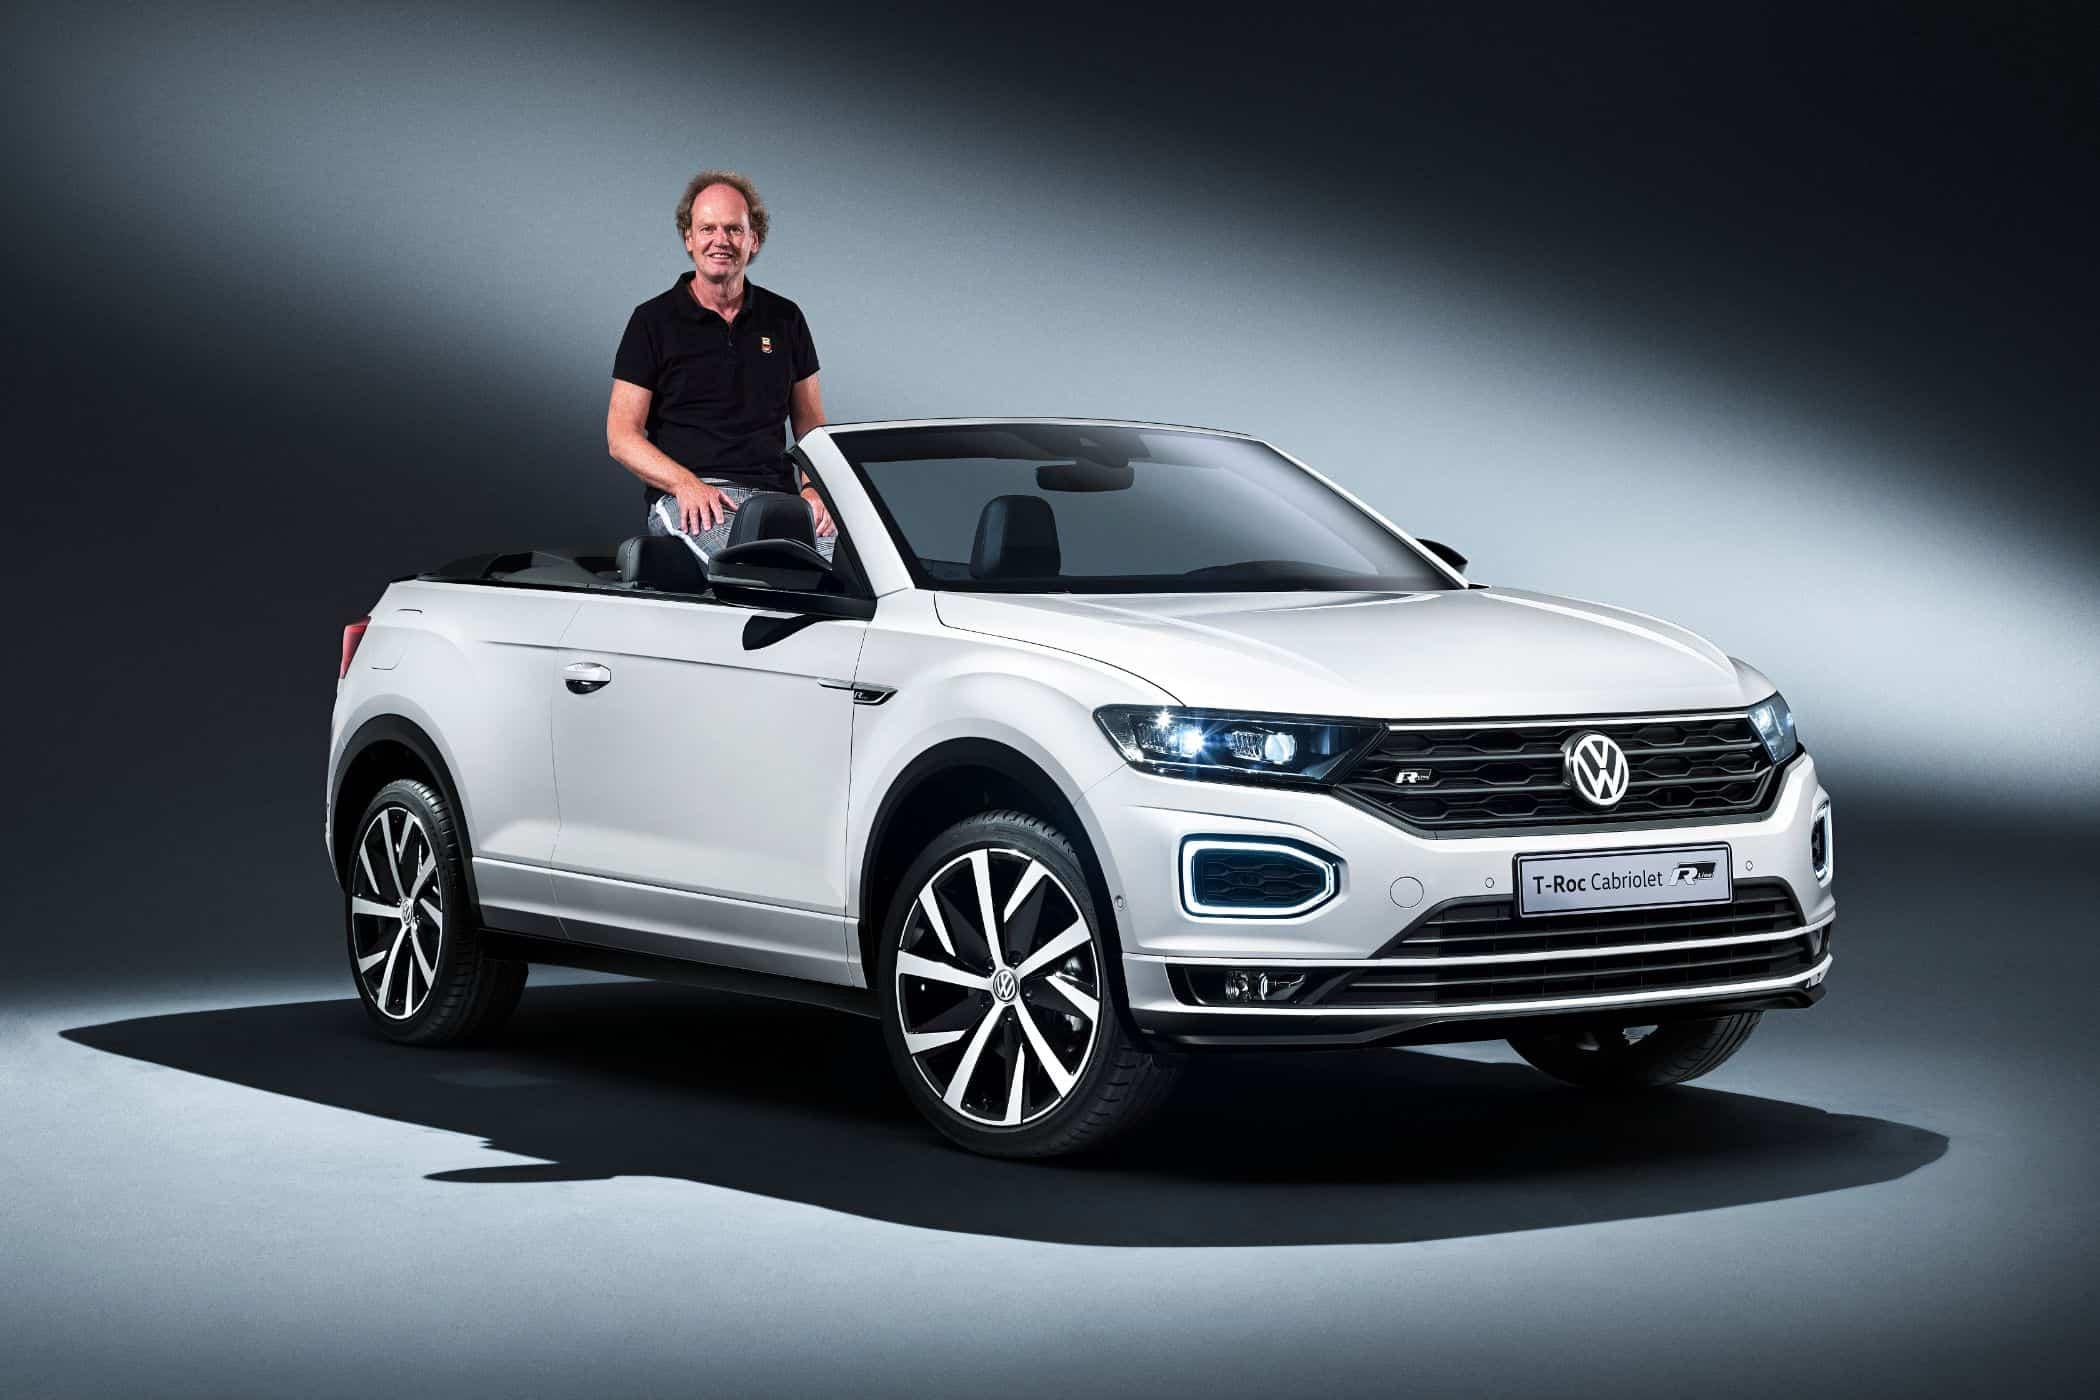 2020 VW T-Roc Cabrio (150 PS) - First View - Sitzprobe I POV I Details I Test